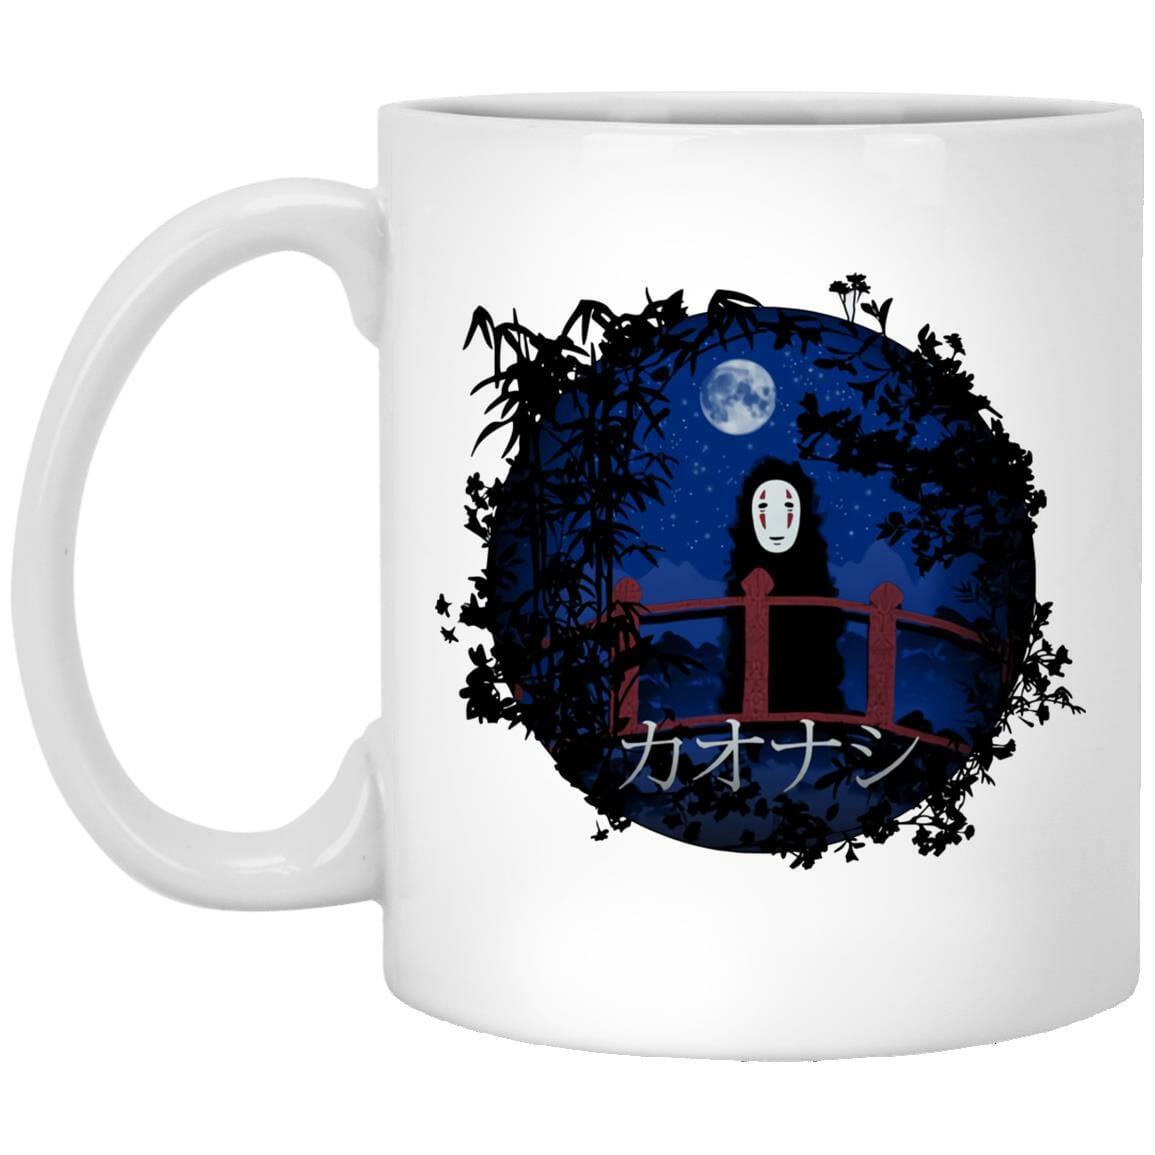 Spirited Away Kaonashi No Face by the blue Moon Mug